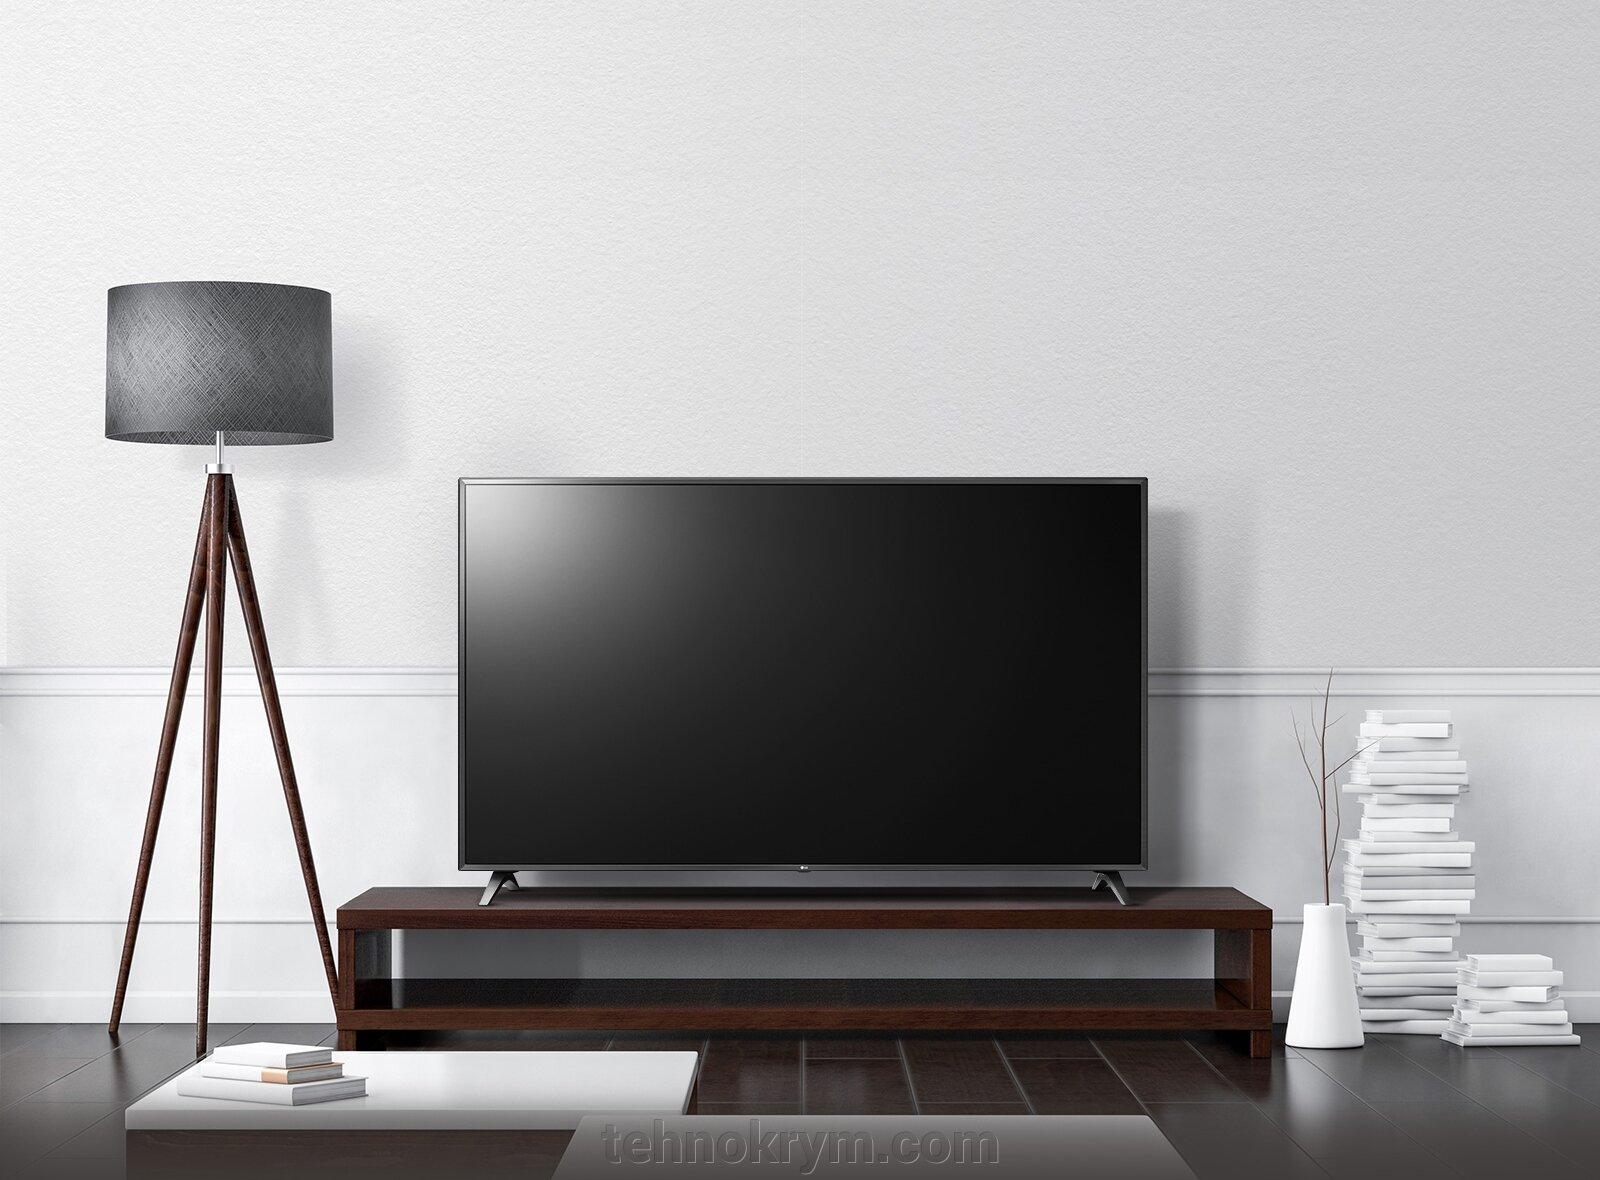 Smart телевизор LG 43UM7500PLA, Ultra HD, титан, webOS 4.5 - фото Телевизор LG 43UM7500PLA